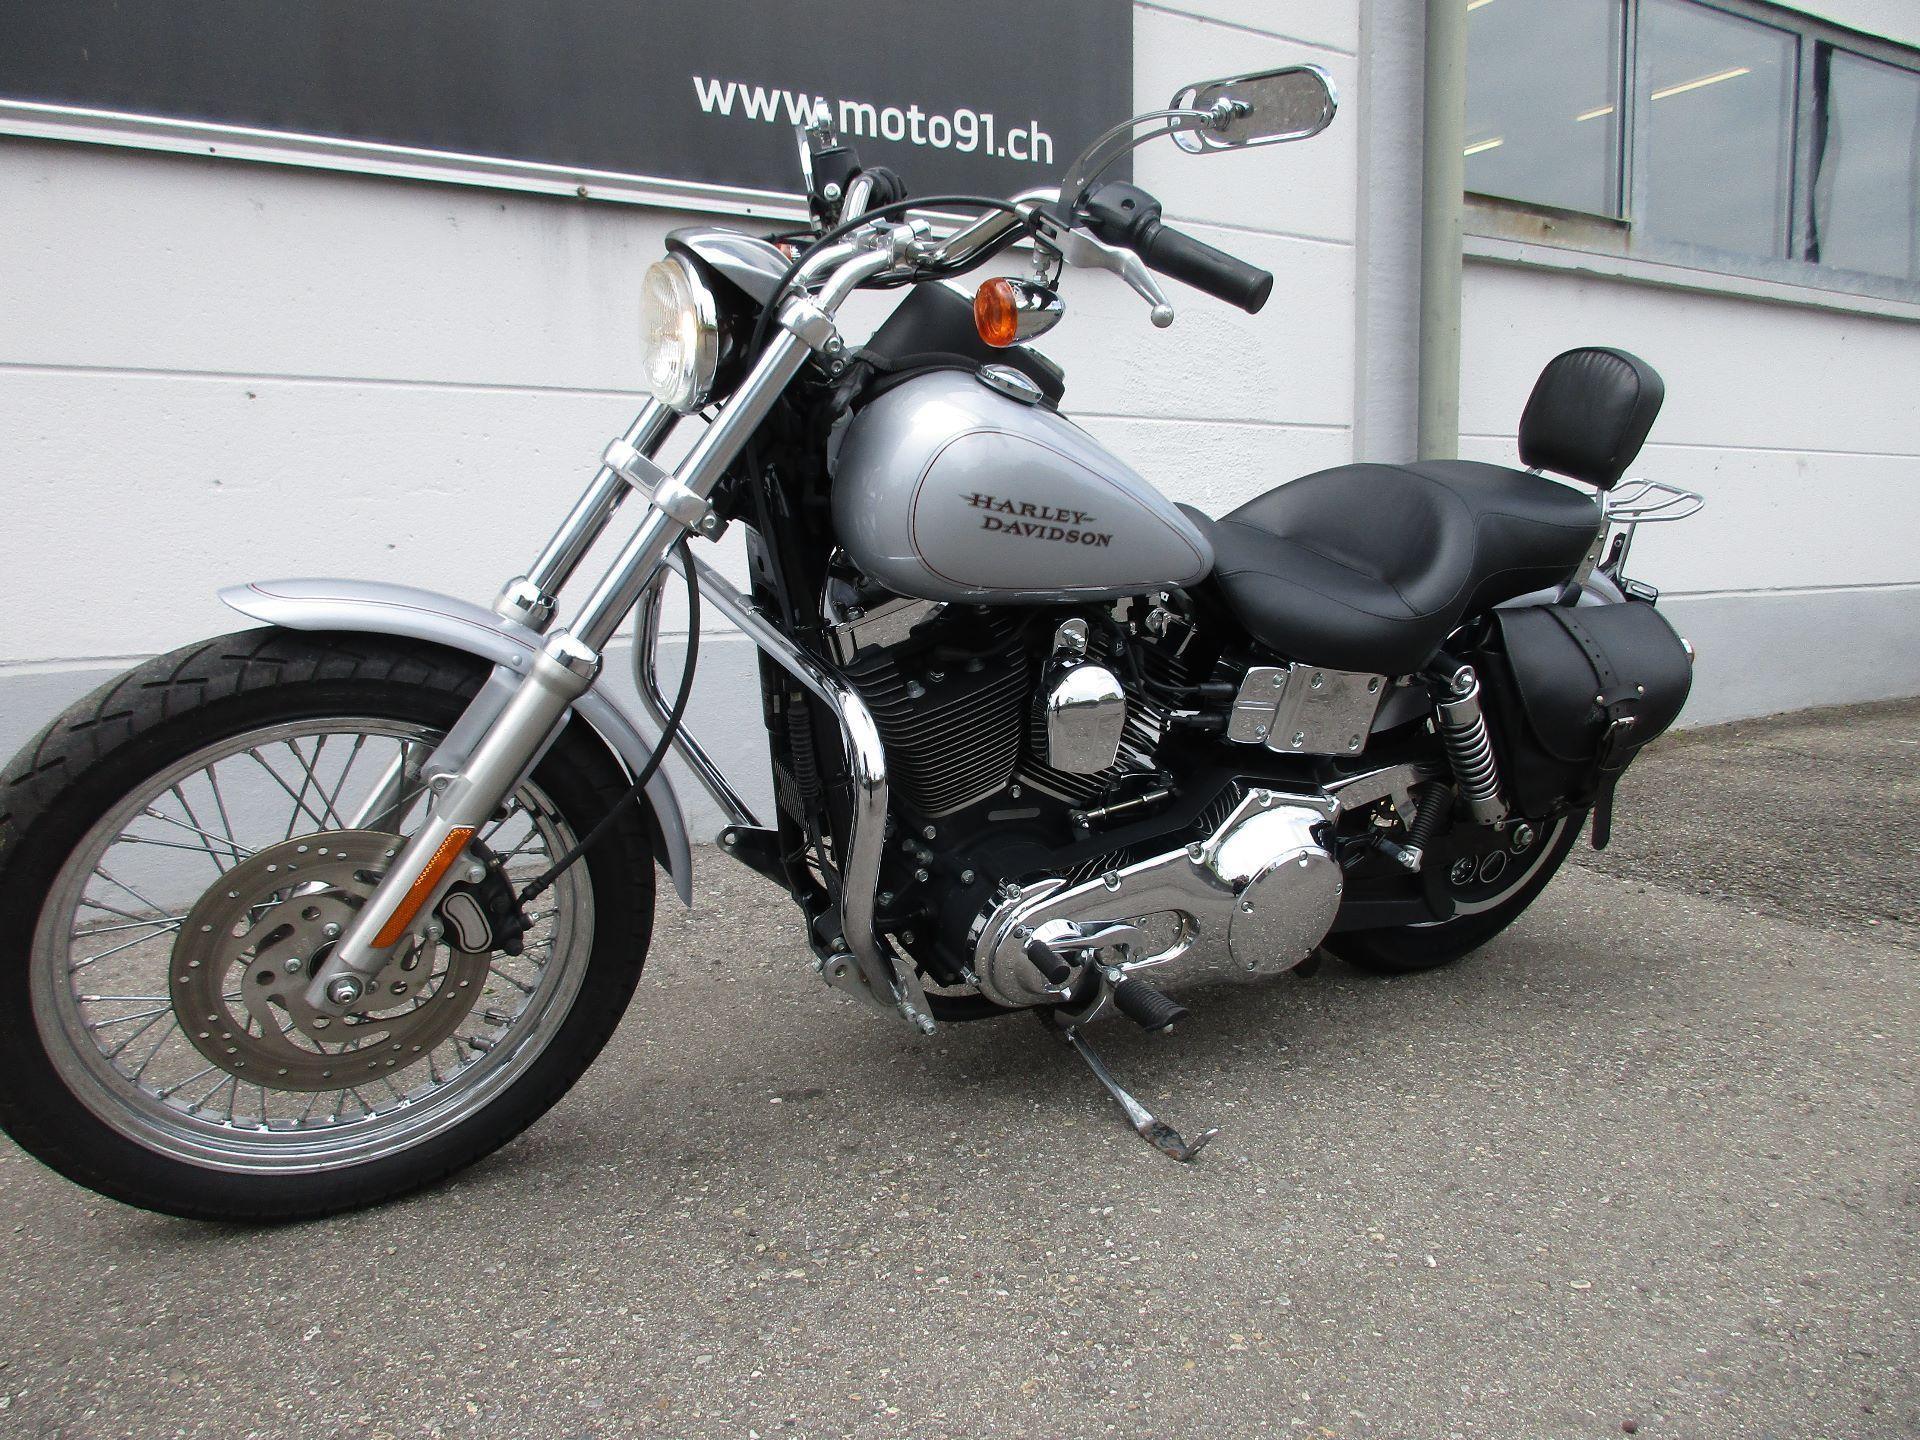 moto occasions acheter harley davidson fxdl 1450 dyna low rider custom moto 91 ag h ri id. Black Bedroom Furniture Sets. Home Design Ideas